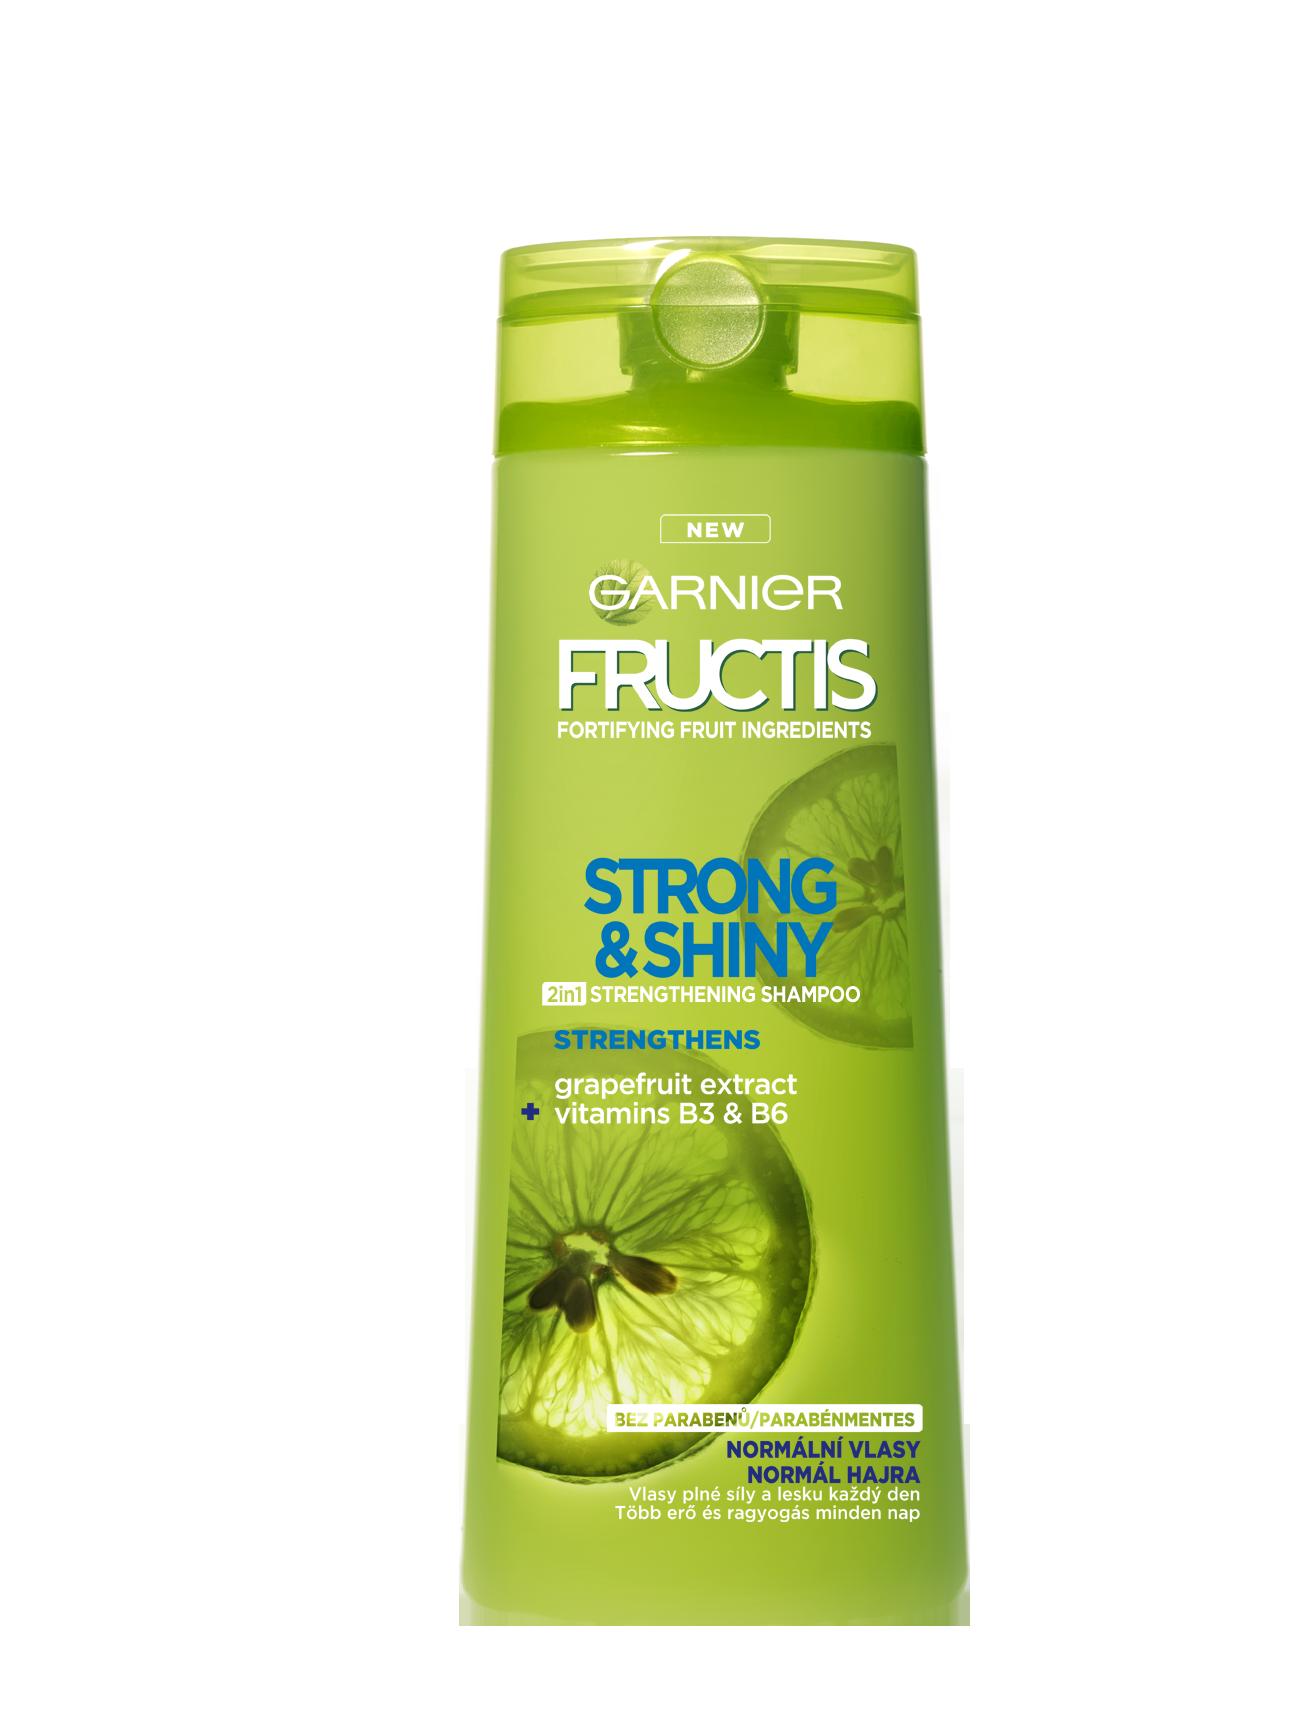 Garnier Fructis Strong & Shiny 2in1 posilující šampon 250 ml